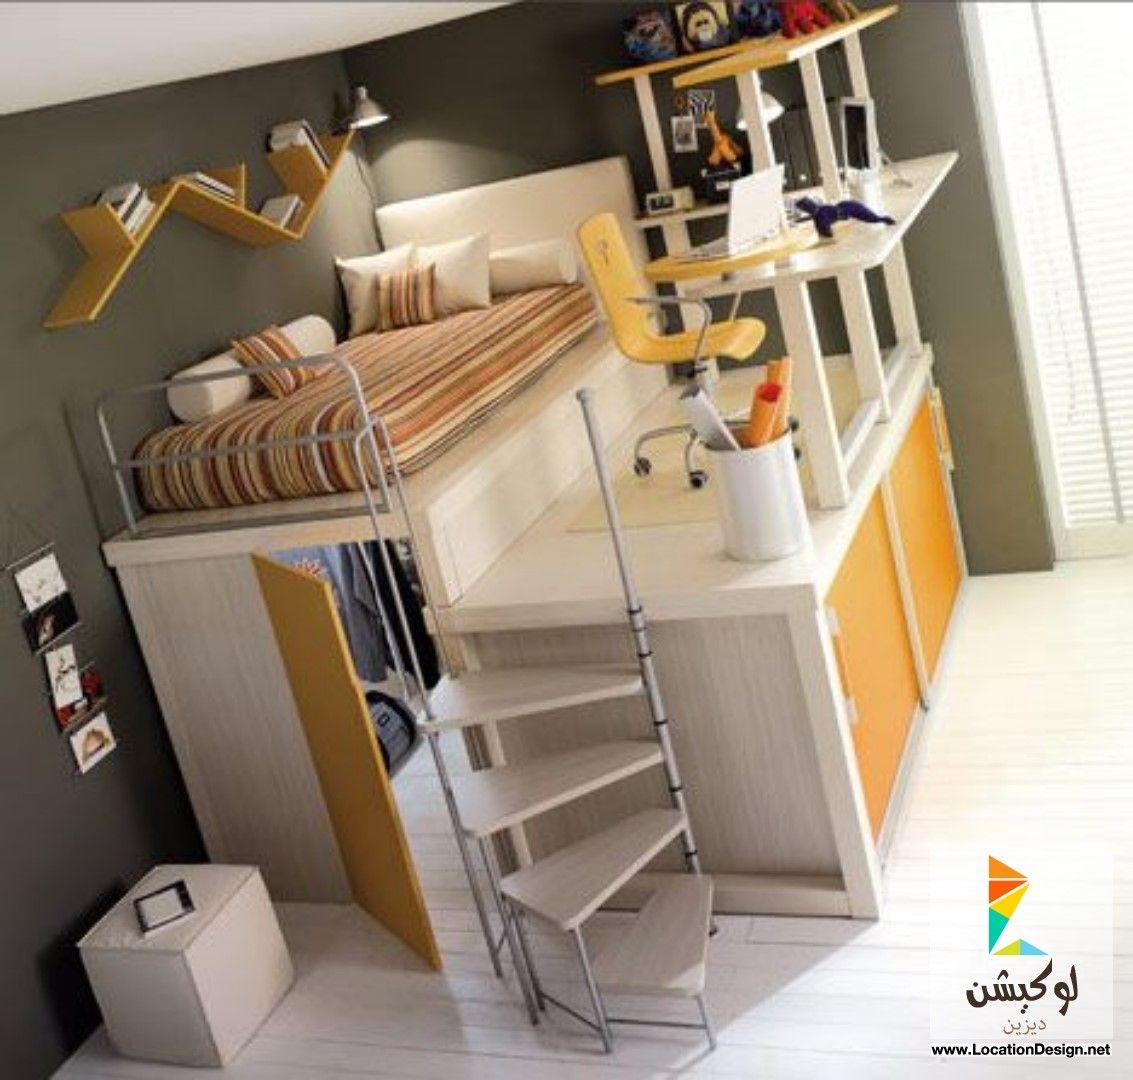 Loft bedroom staircase  غرف نوم مودرن اولاد مراهقين   ديكورات غرف نوم  Pinterest